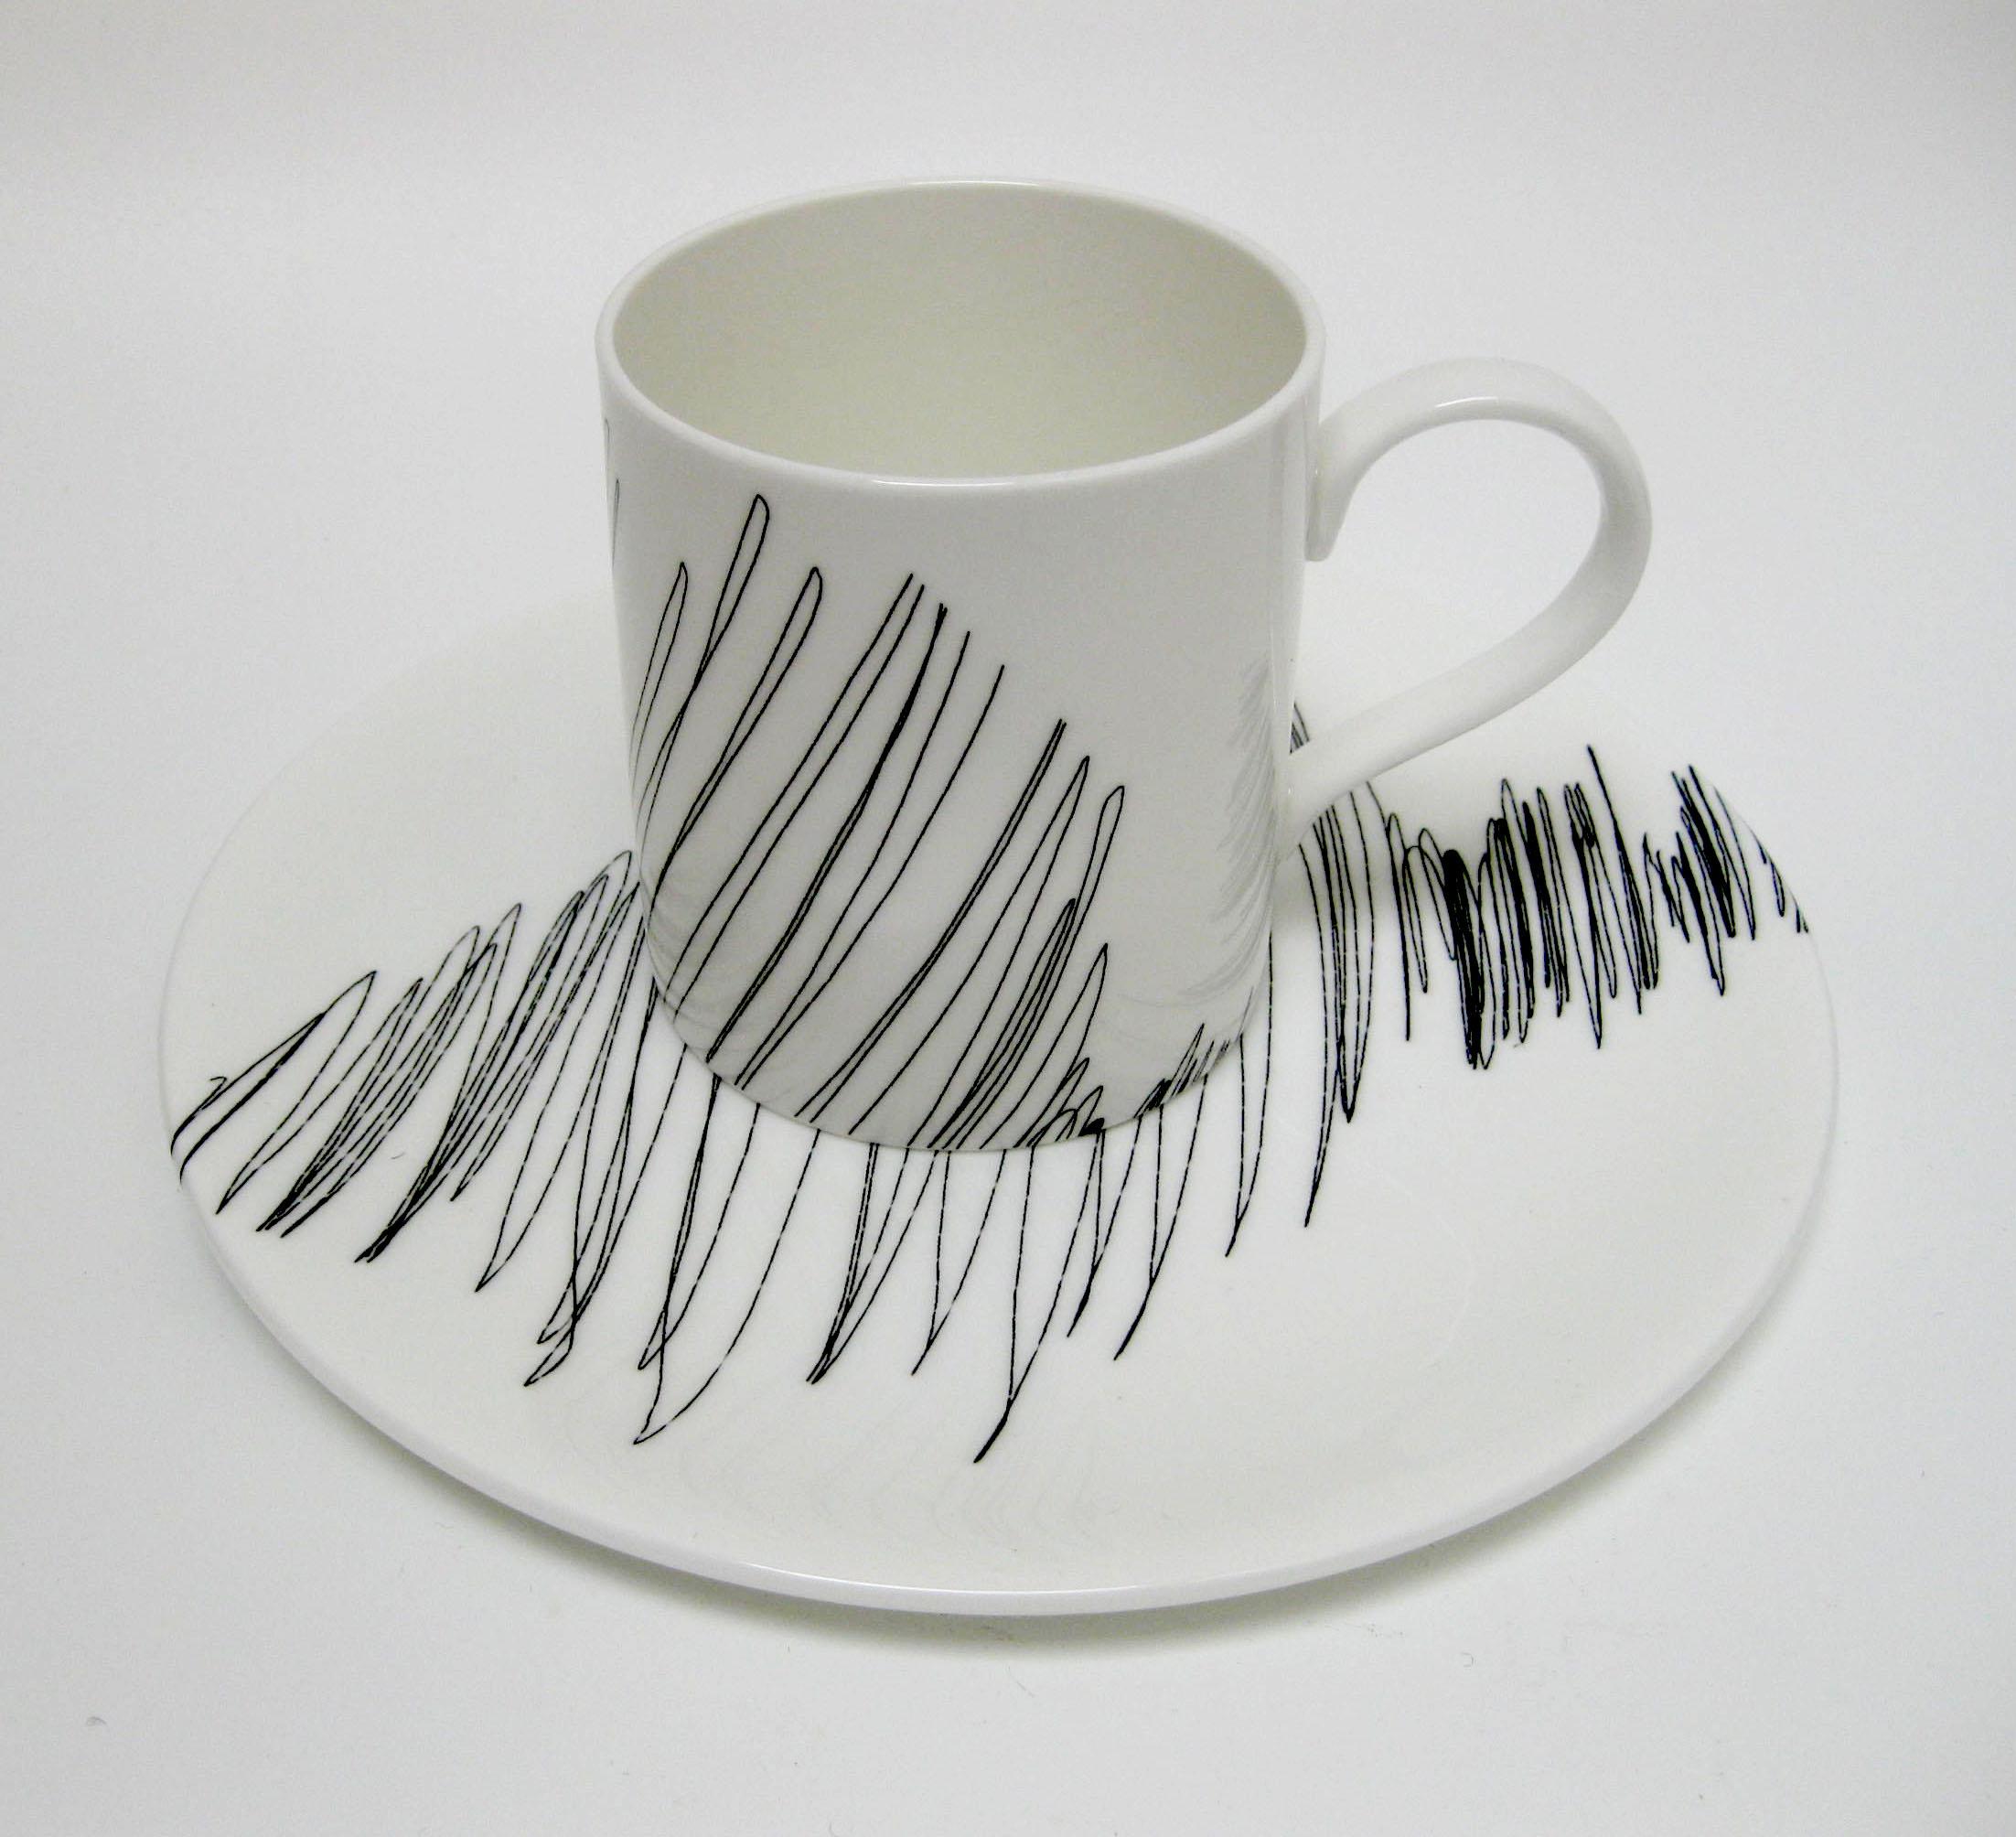 Scribble - Plate and Mug RHS